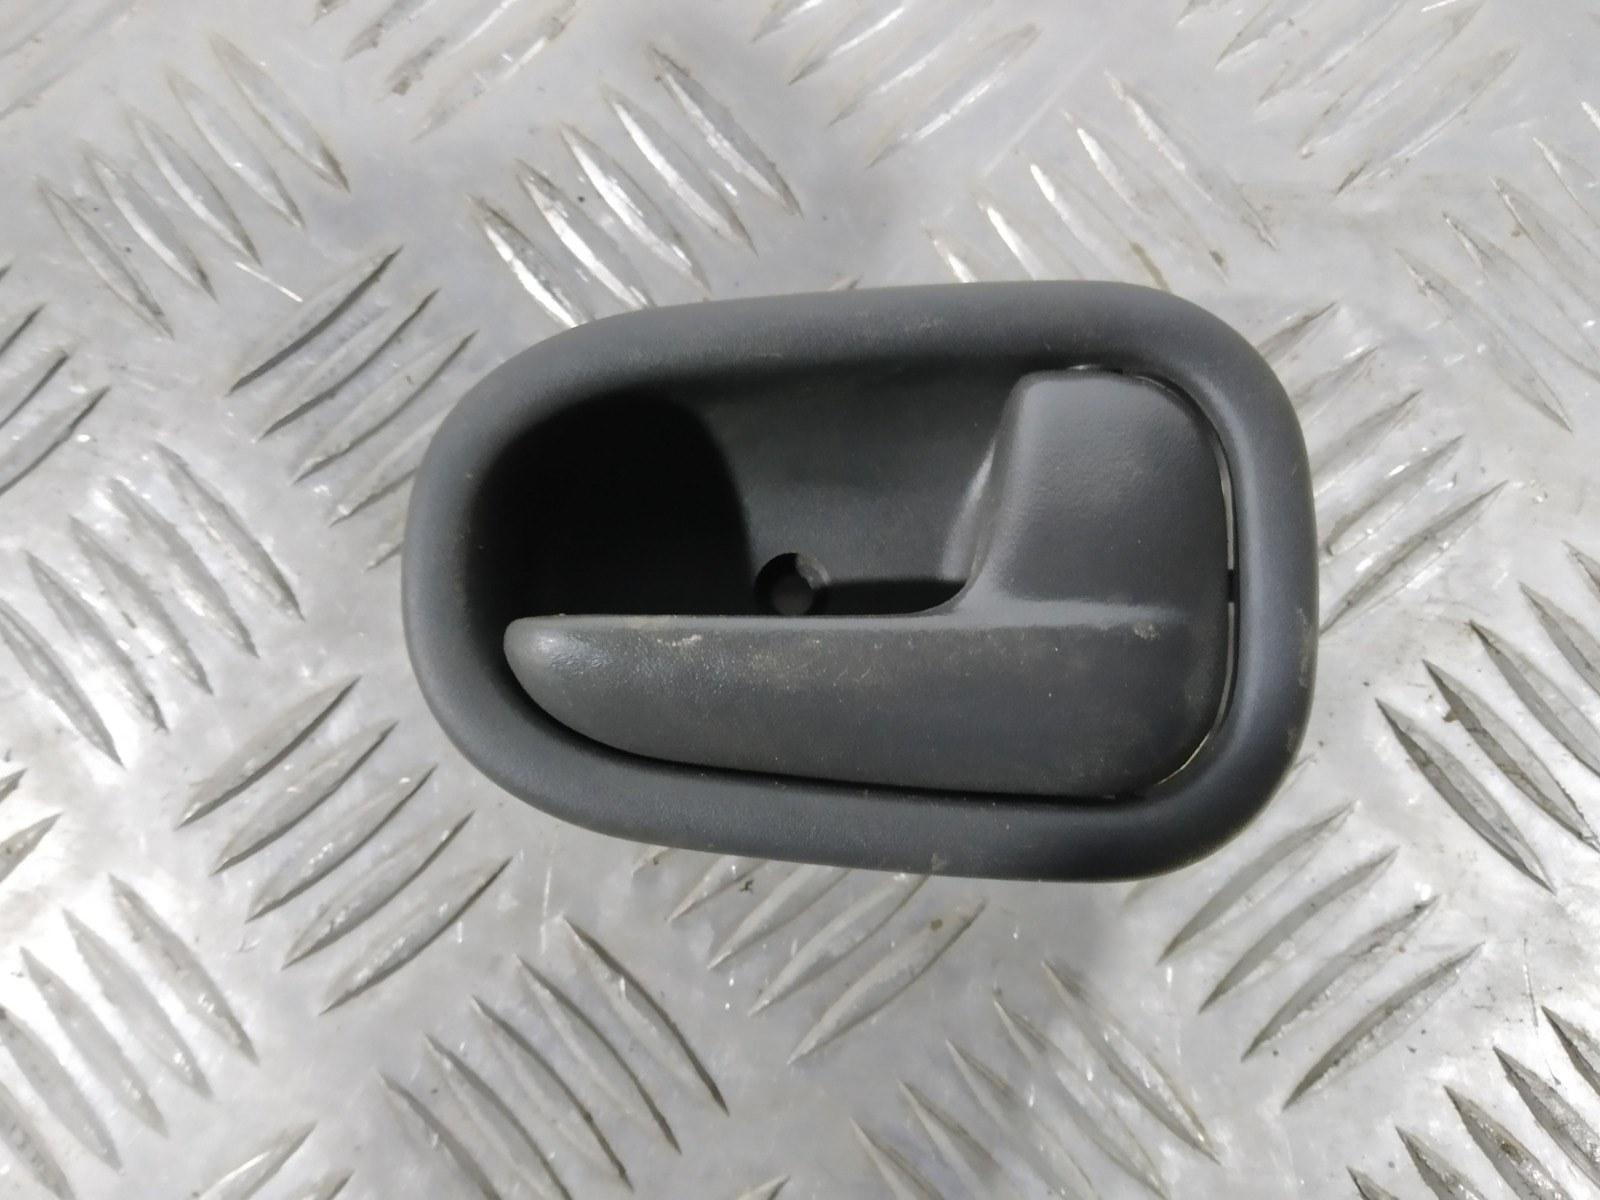 Ручка внутренняя задняя правая Kia Sportage 2.0 I 2003 (б/у)